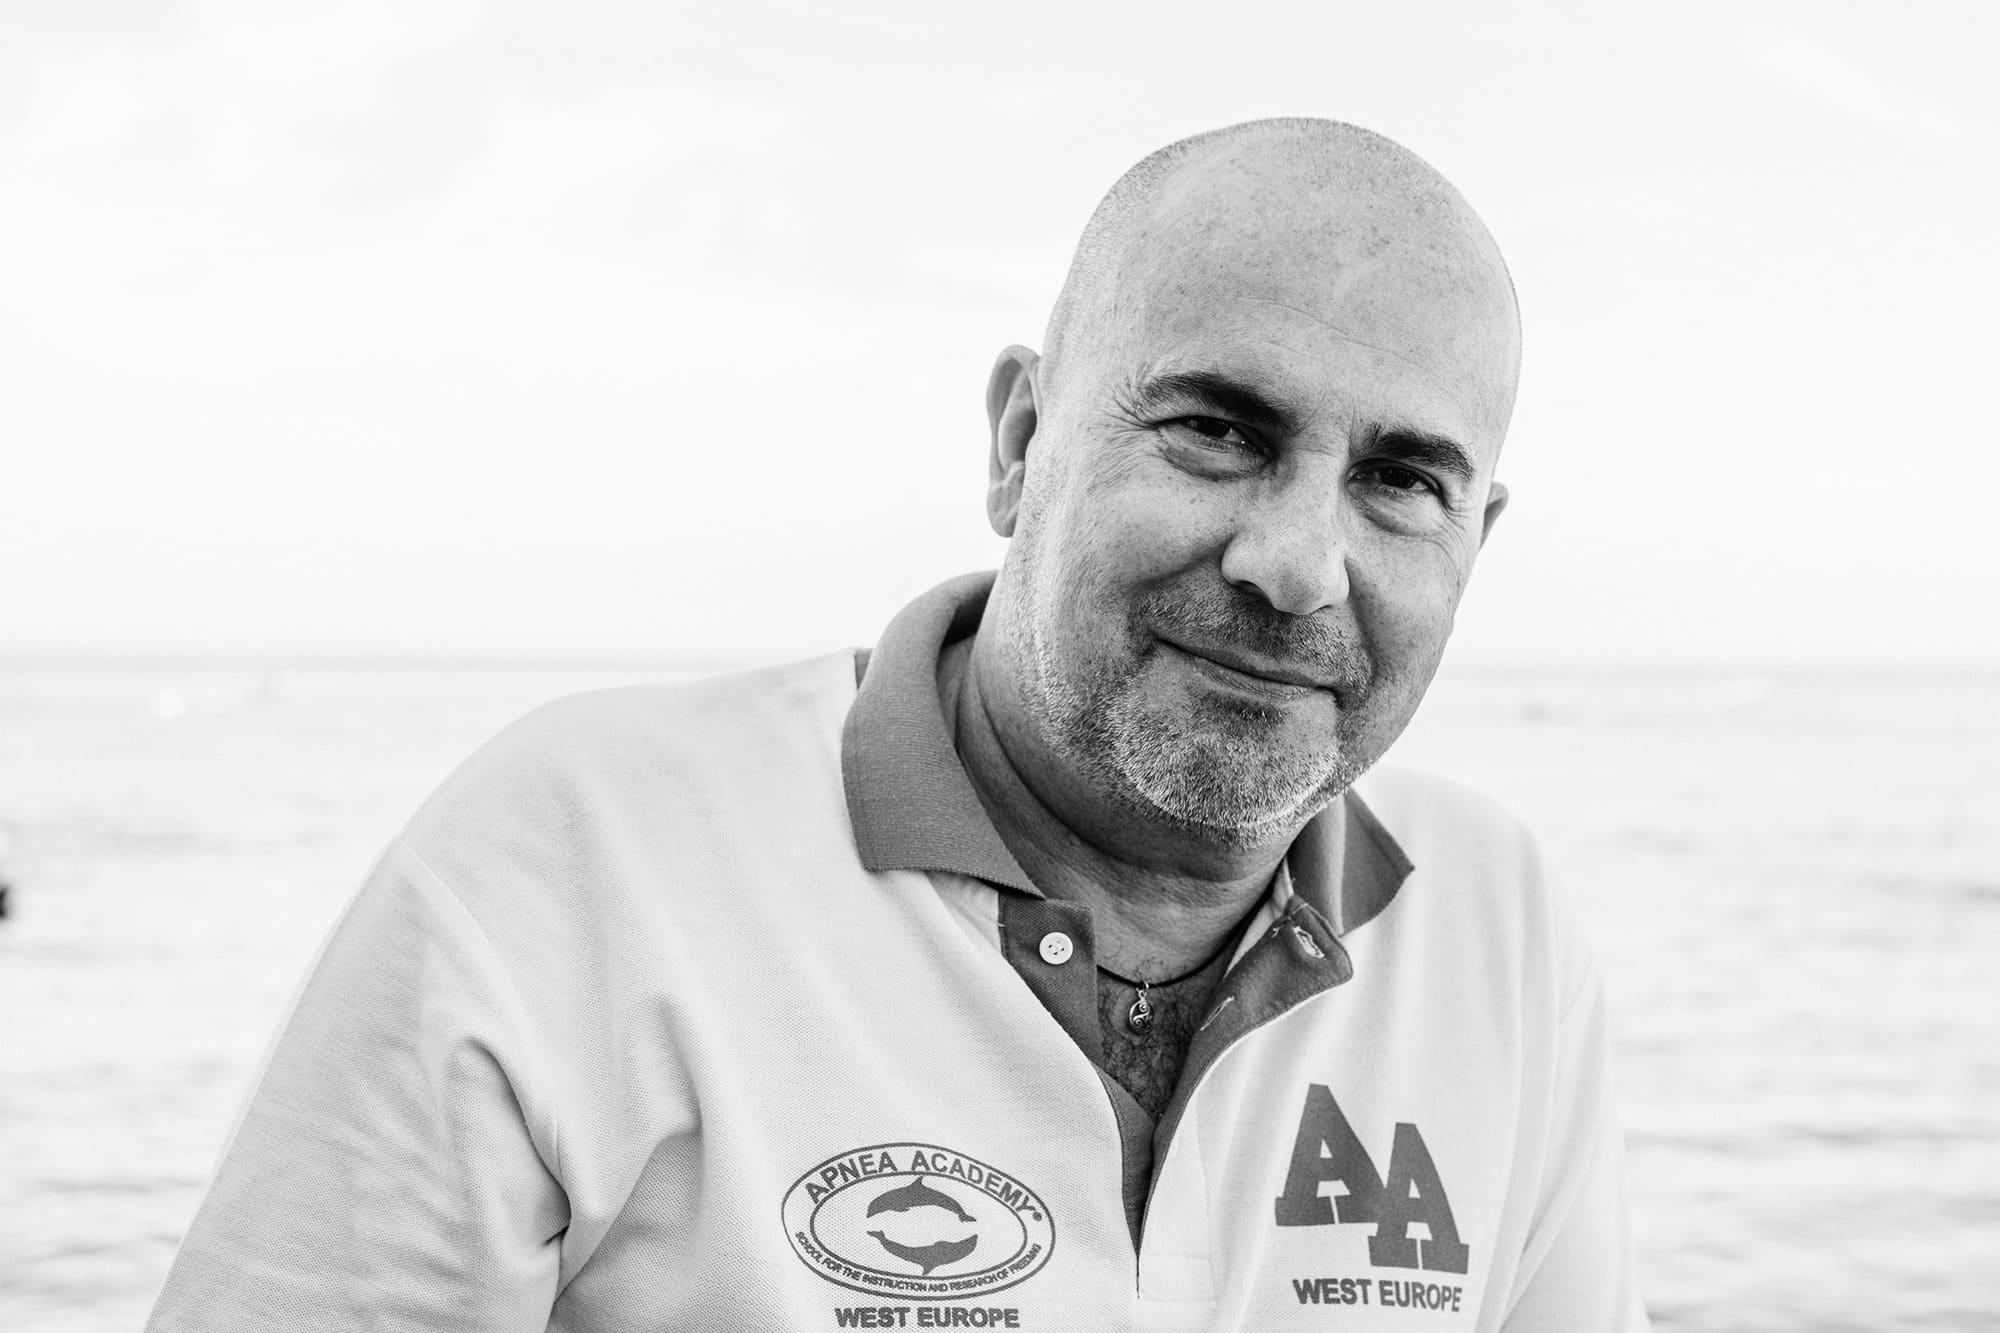 Paco González, gerente de Apnea Academy en Adeje